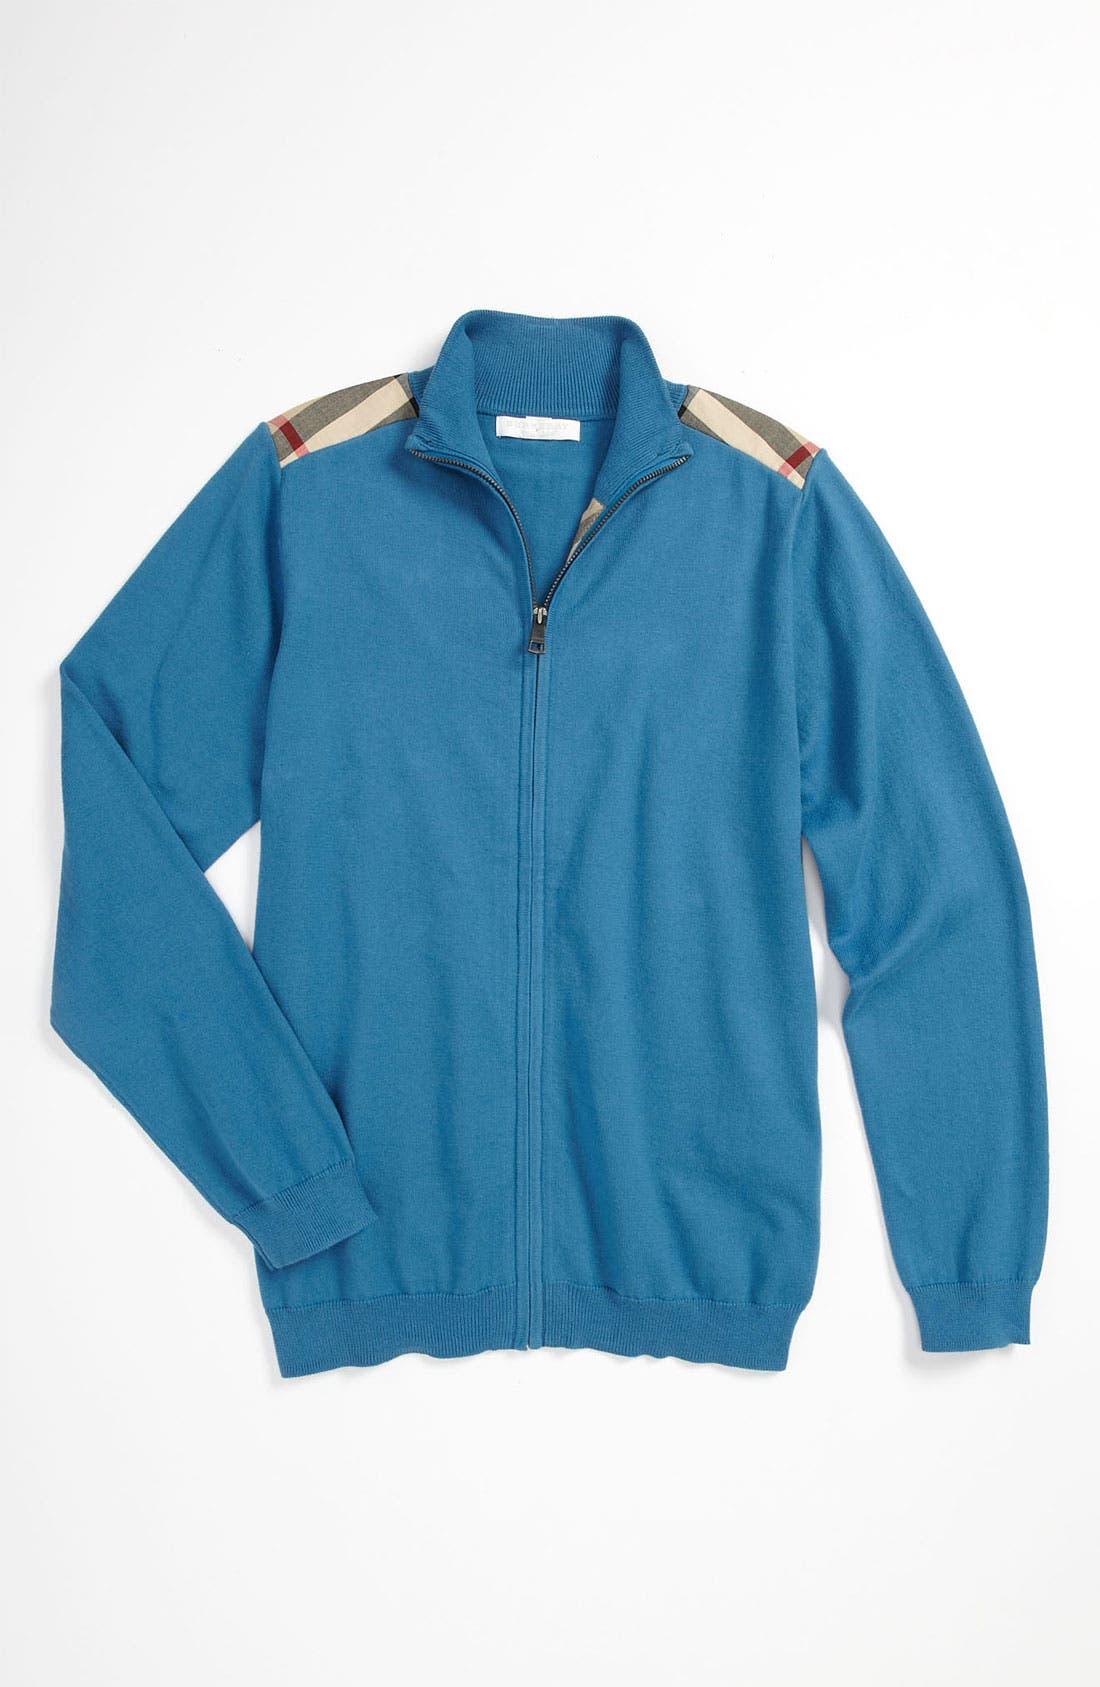 Alternate Image 1 Selected - Burberry Mock Neck Sweater (Little Boys & Big Boys)